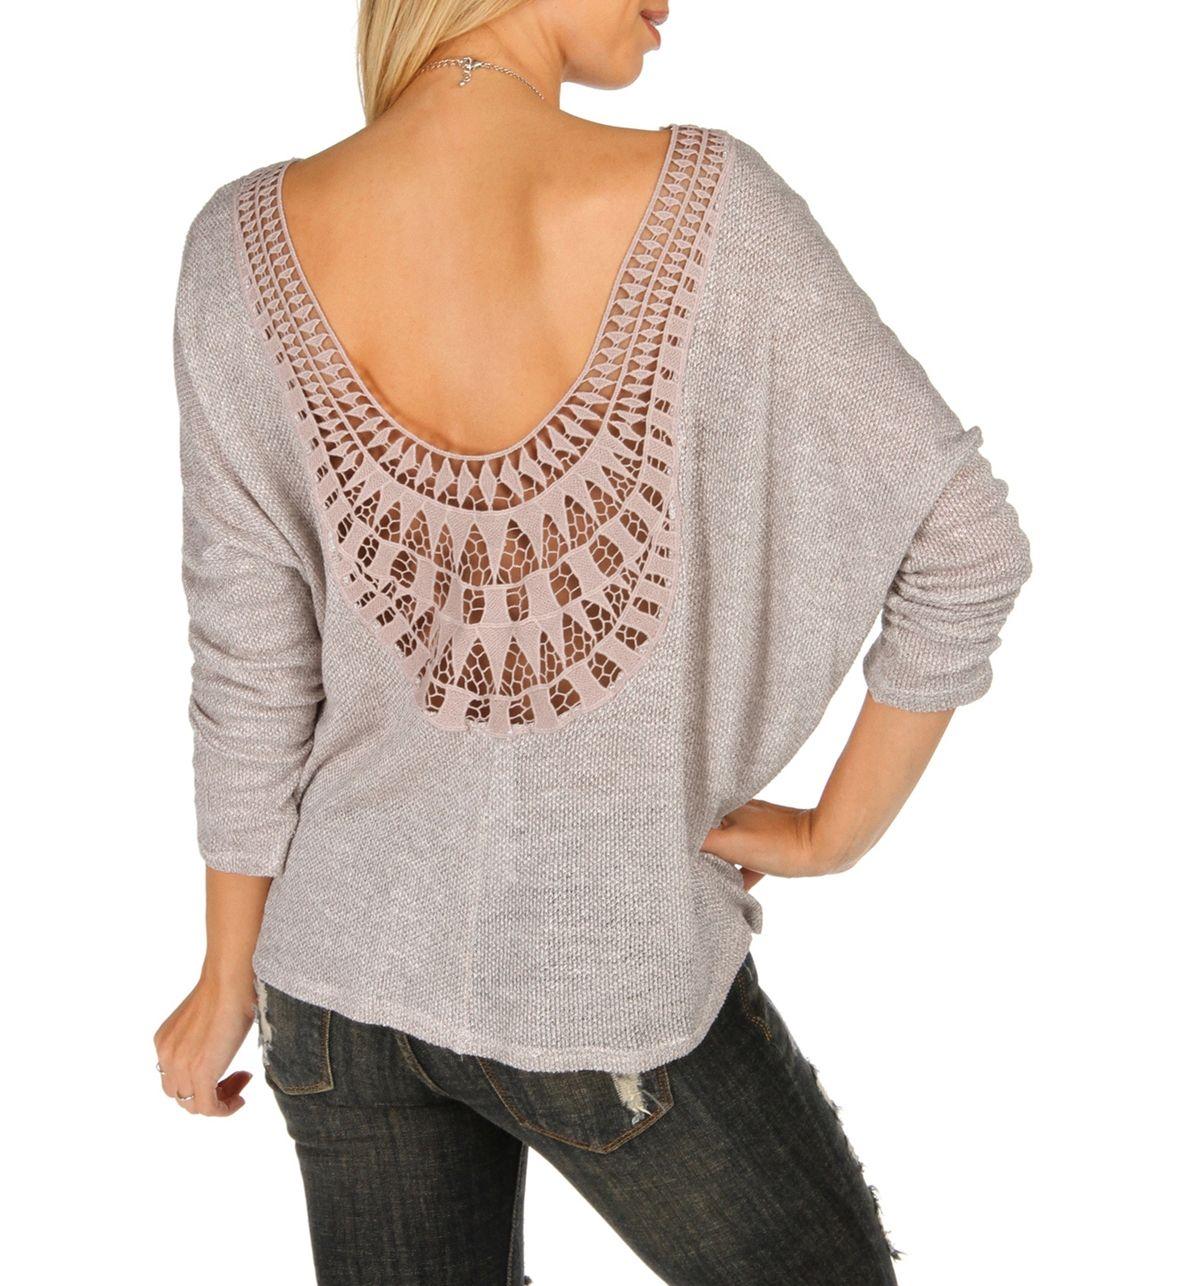 Natural Crochet Back Dolman Top